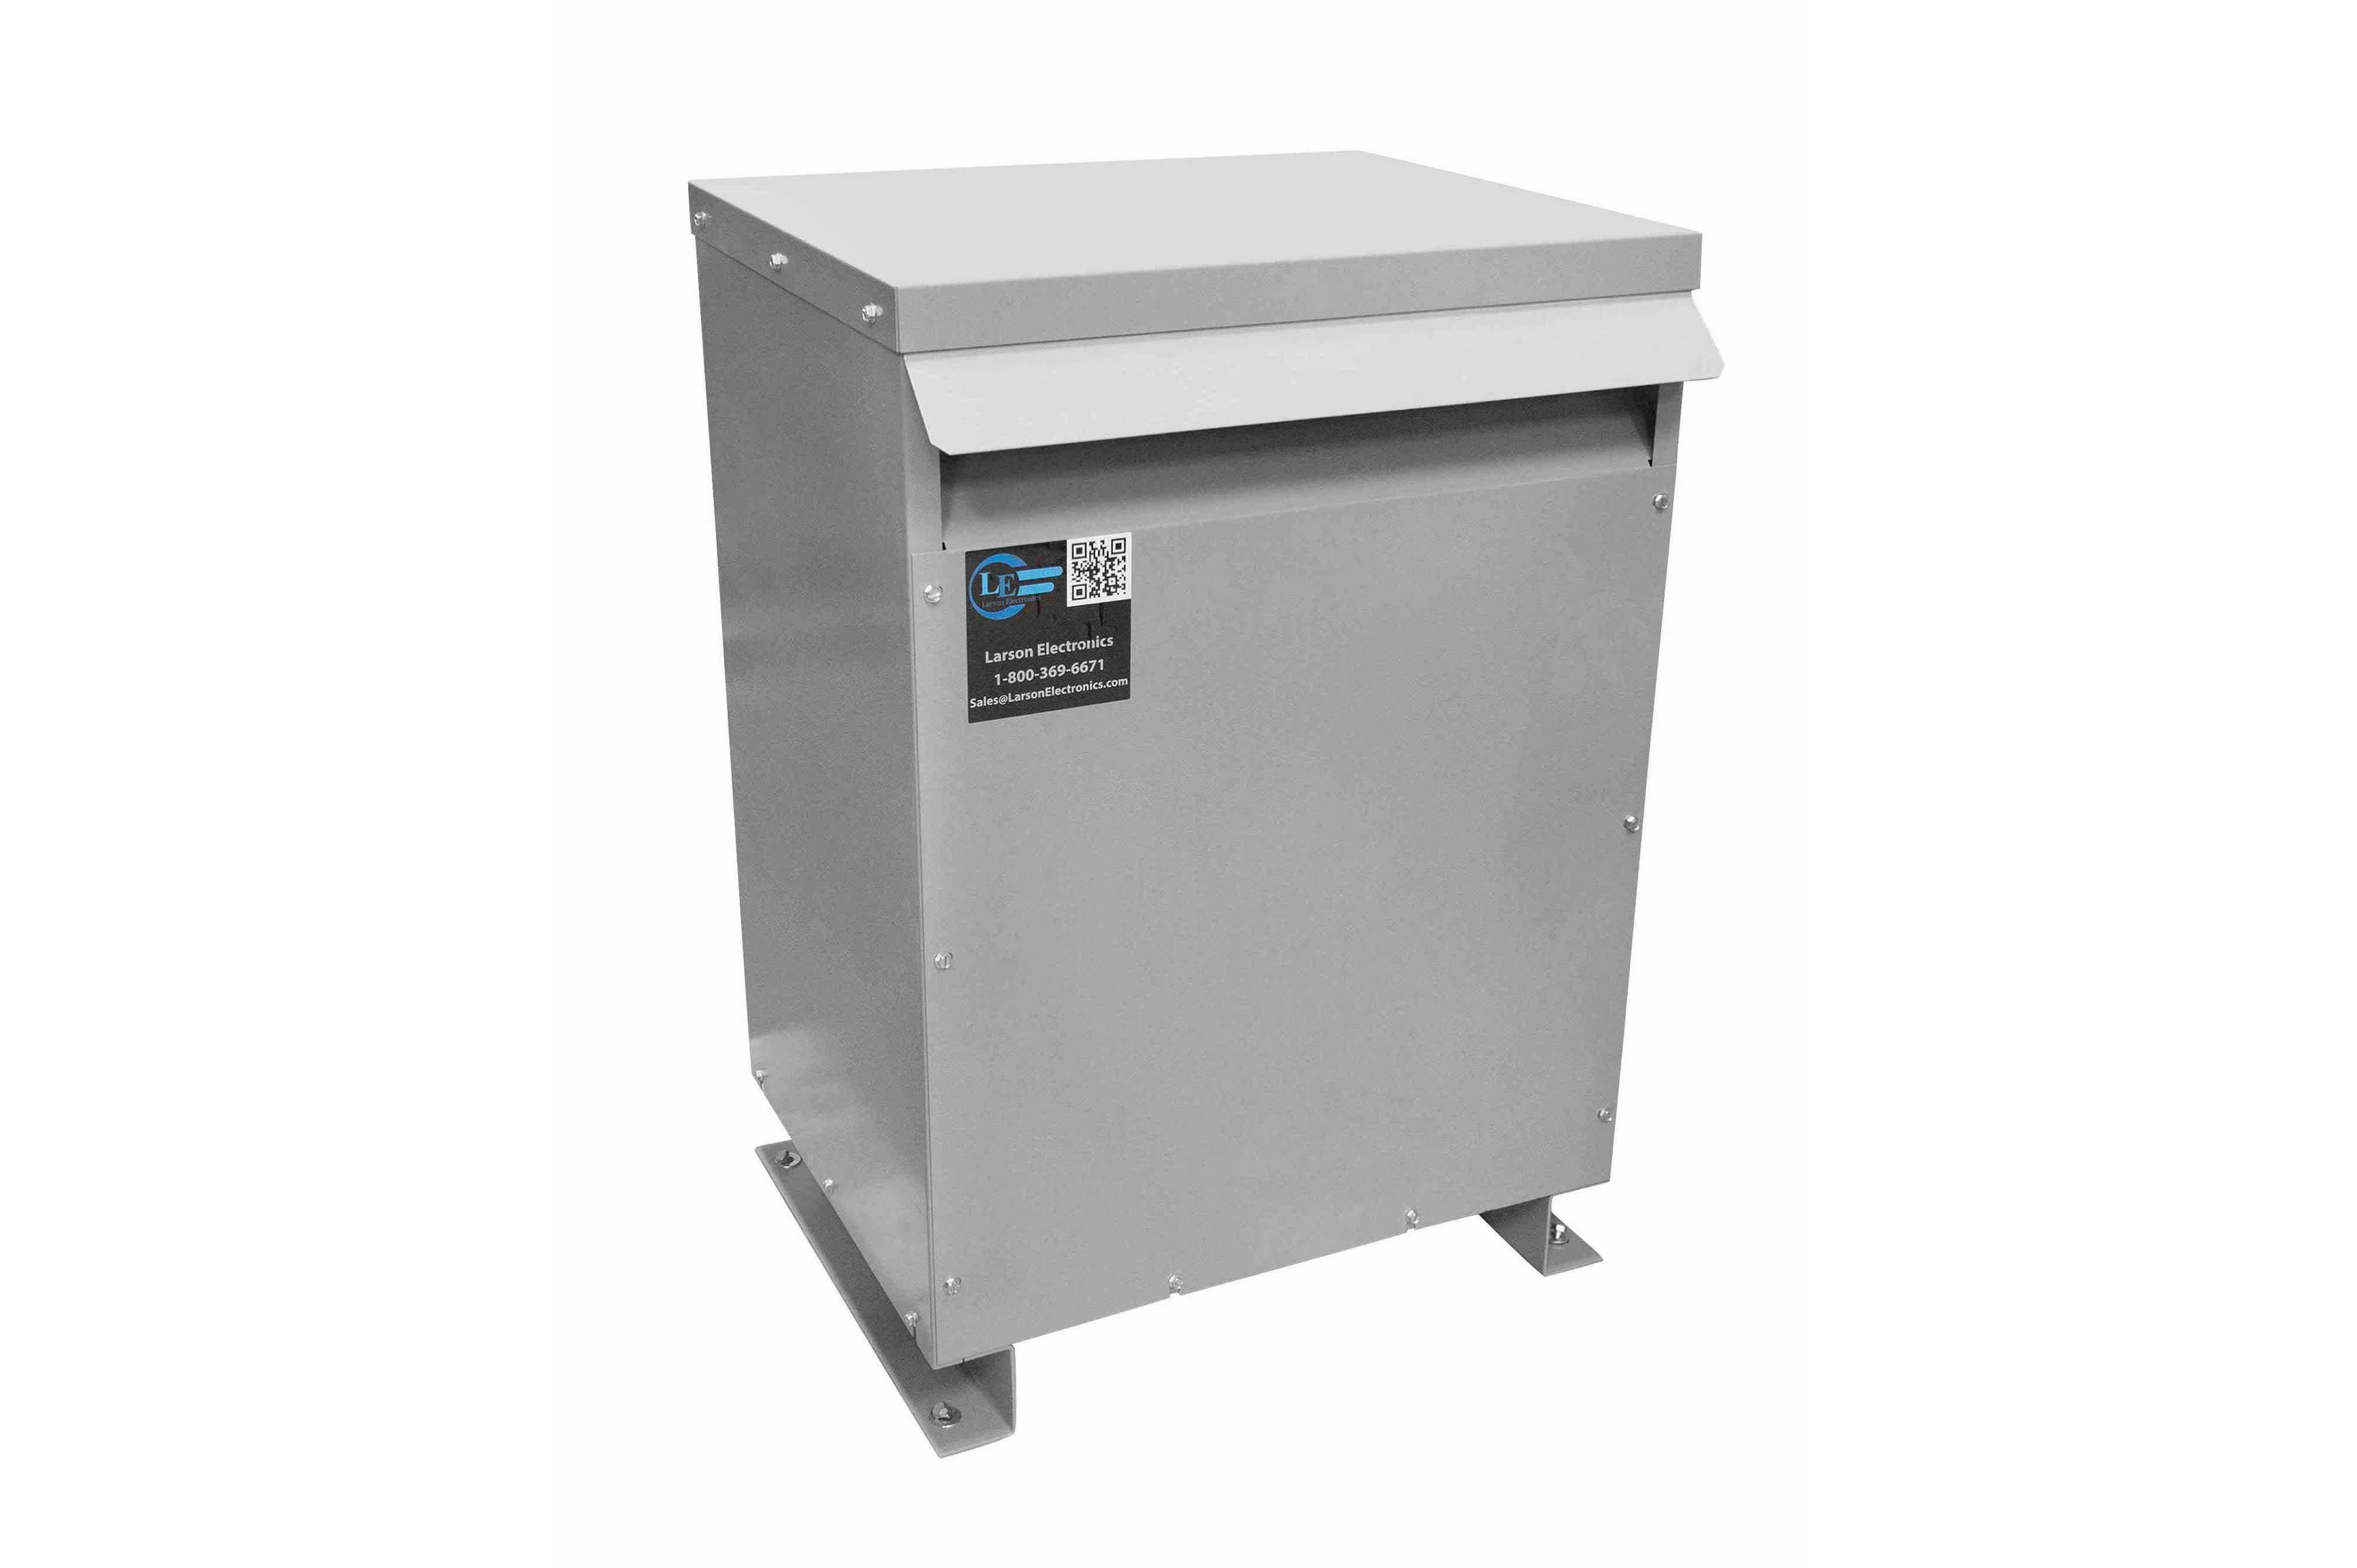 25 kVA 3PH Isolation Transformer, 240V Wye Primary, 208Y/120 Wye-N Secondary, N3R, Ventilated, 60 Hz